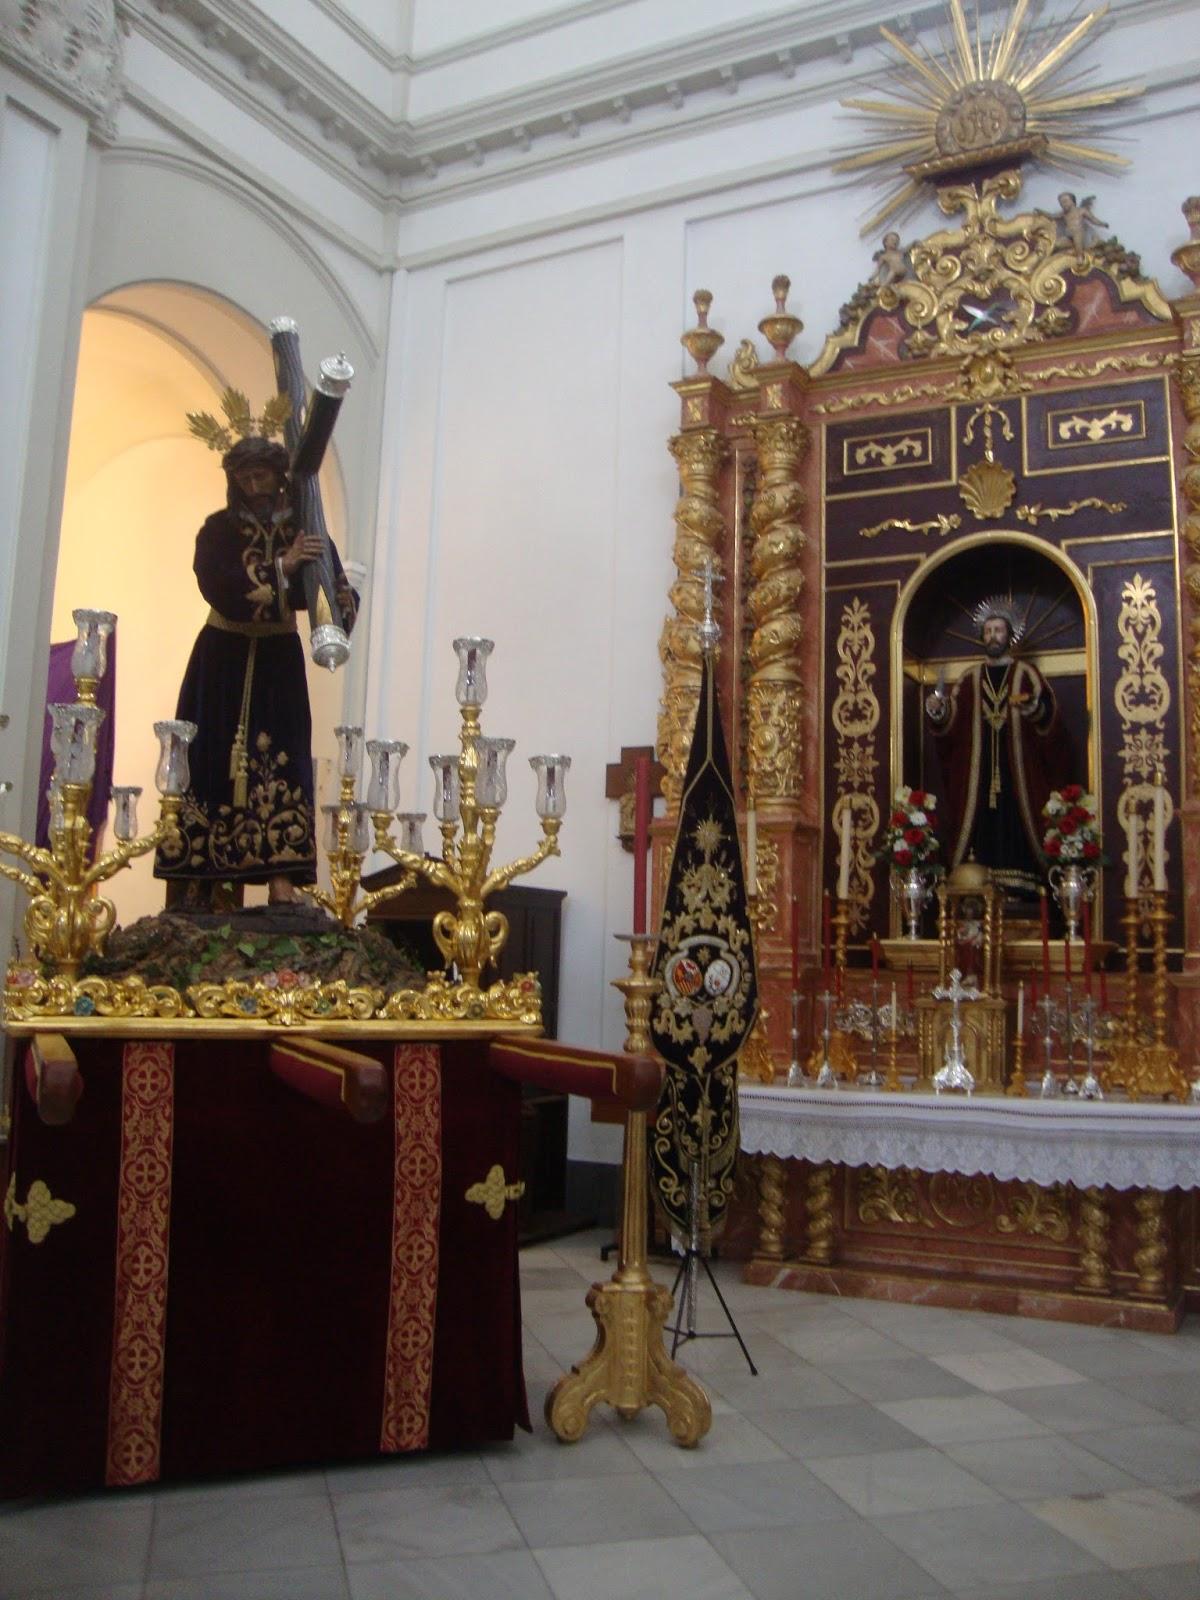 Sacramental de rociana ii v a crucis nazareno del - Fotos antiguas de rociana del condado ...